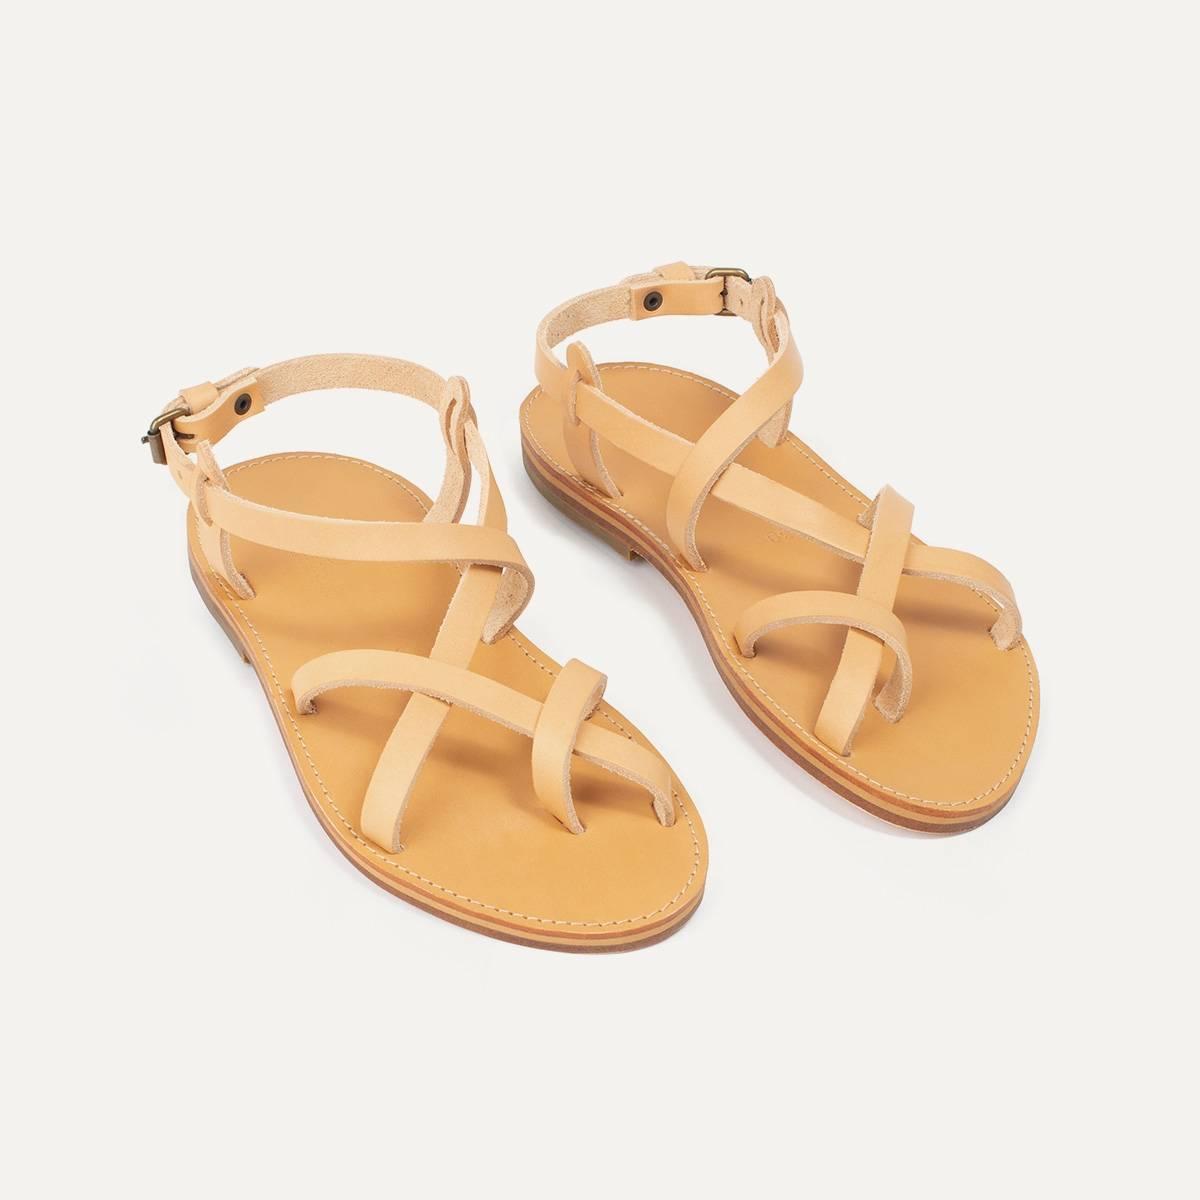 Nara leather sandals - Natural (image n°4)